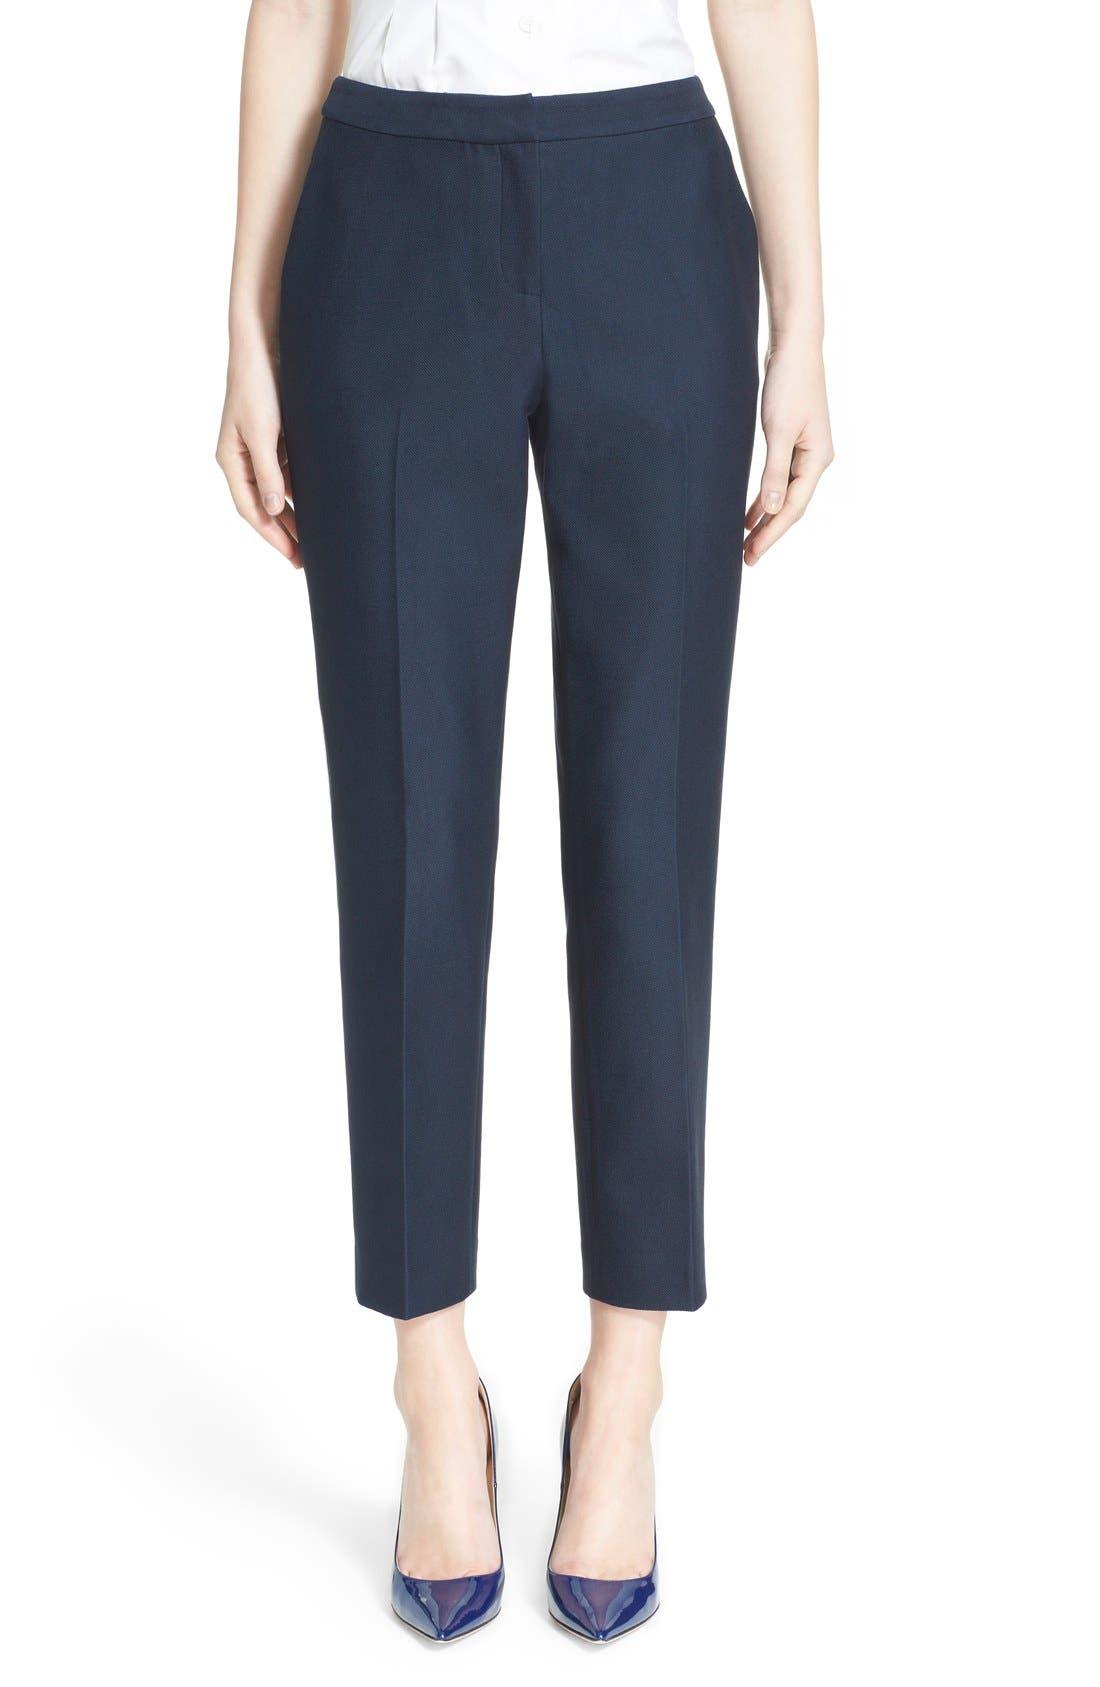 Alternate Image 1 Selected - Nordstrom Signature and Caroline Issa 'Raindrop' Slim Cotton Ankle Pants